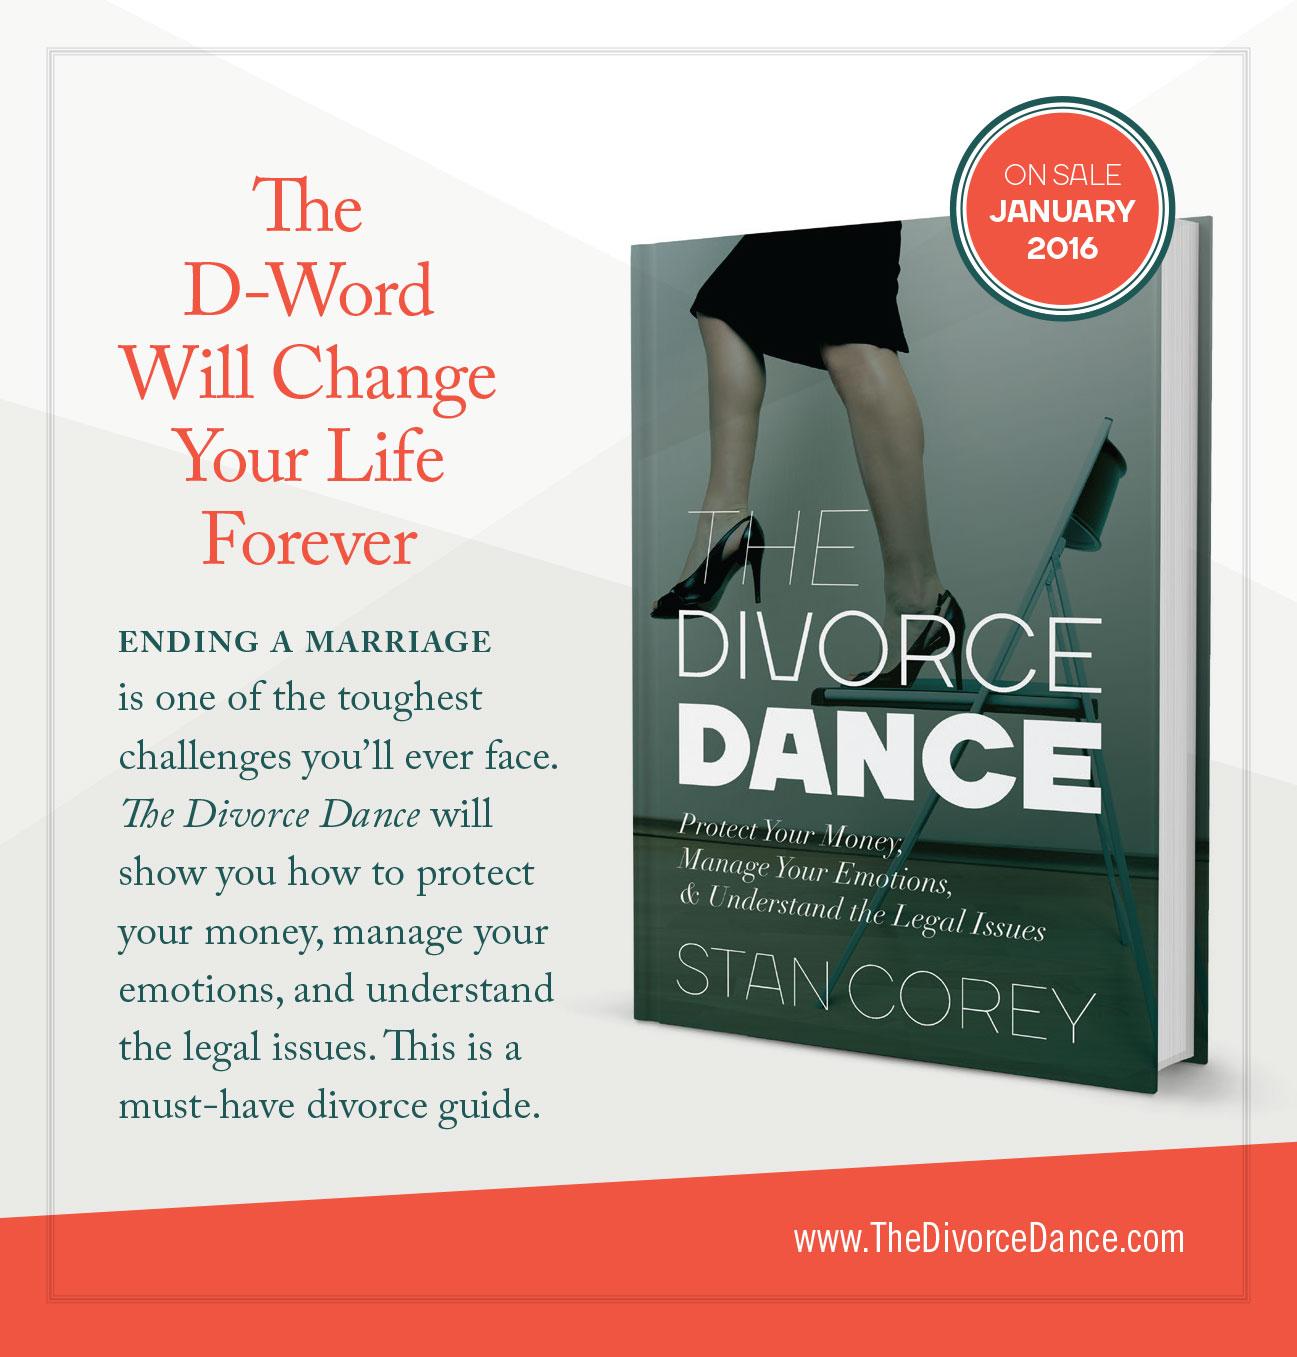 Foremost Financial Advisor Publishes Comprehensive Divorce Guide